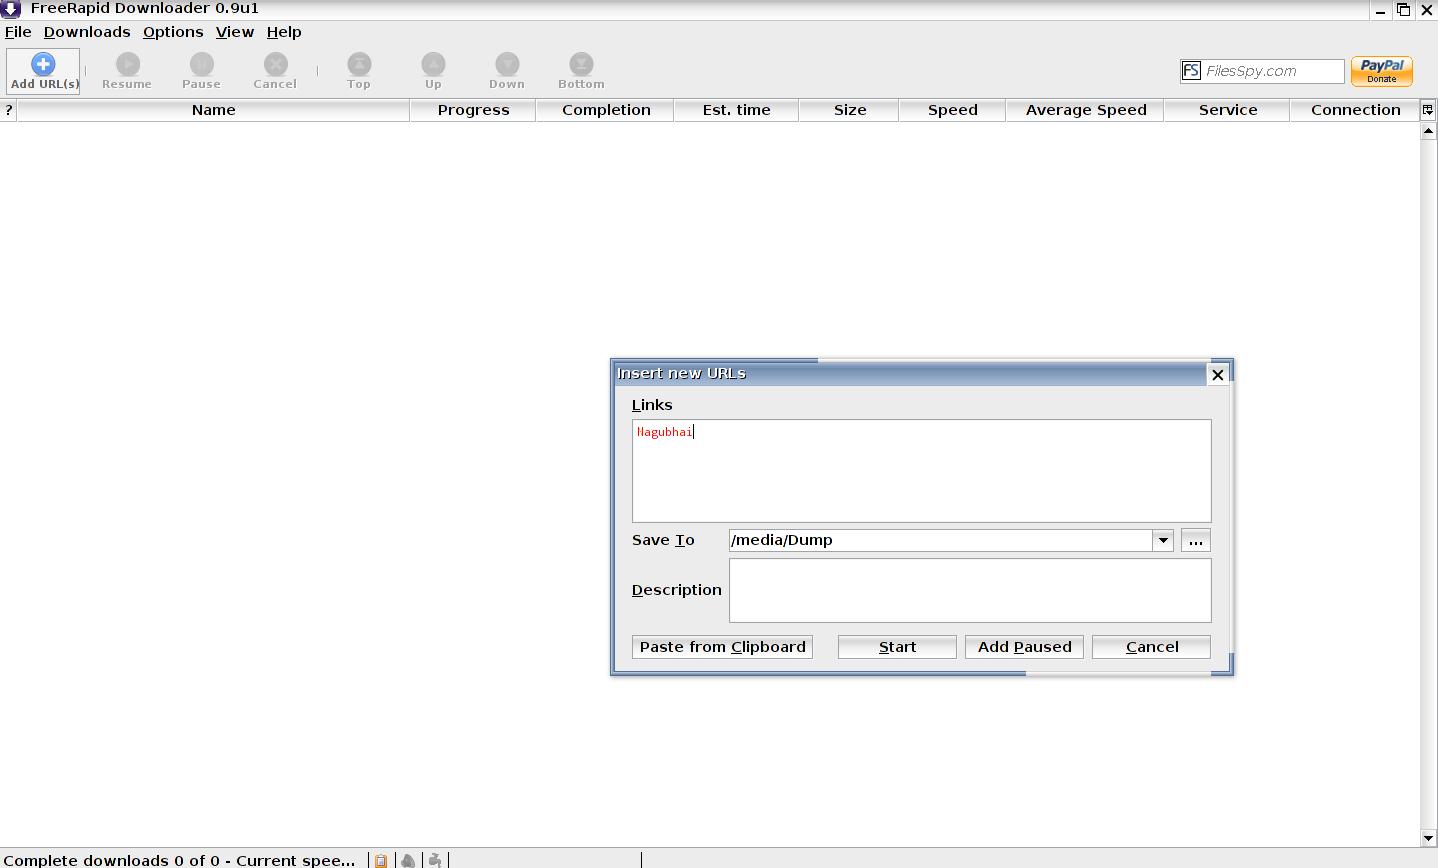 FreeRapid Downloader 0.9 Update,  , FreeRapid Downloader , freewares, DOWNLOAD MANAGER, ubuntu softwares, linux softwares,